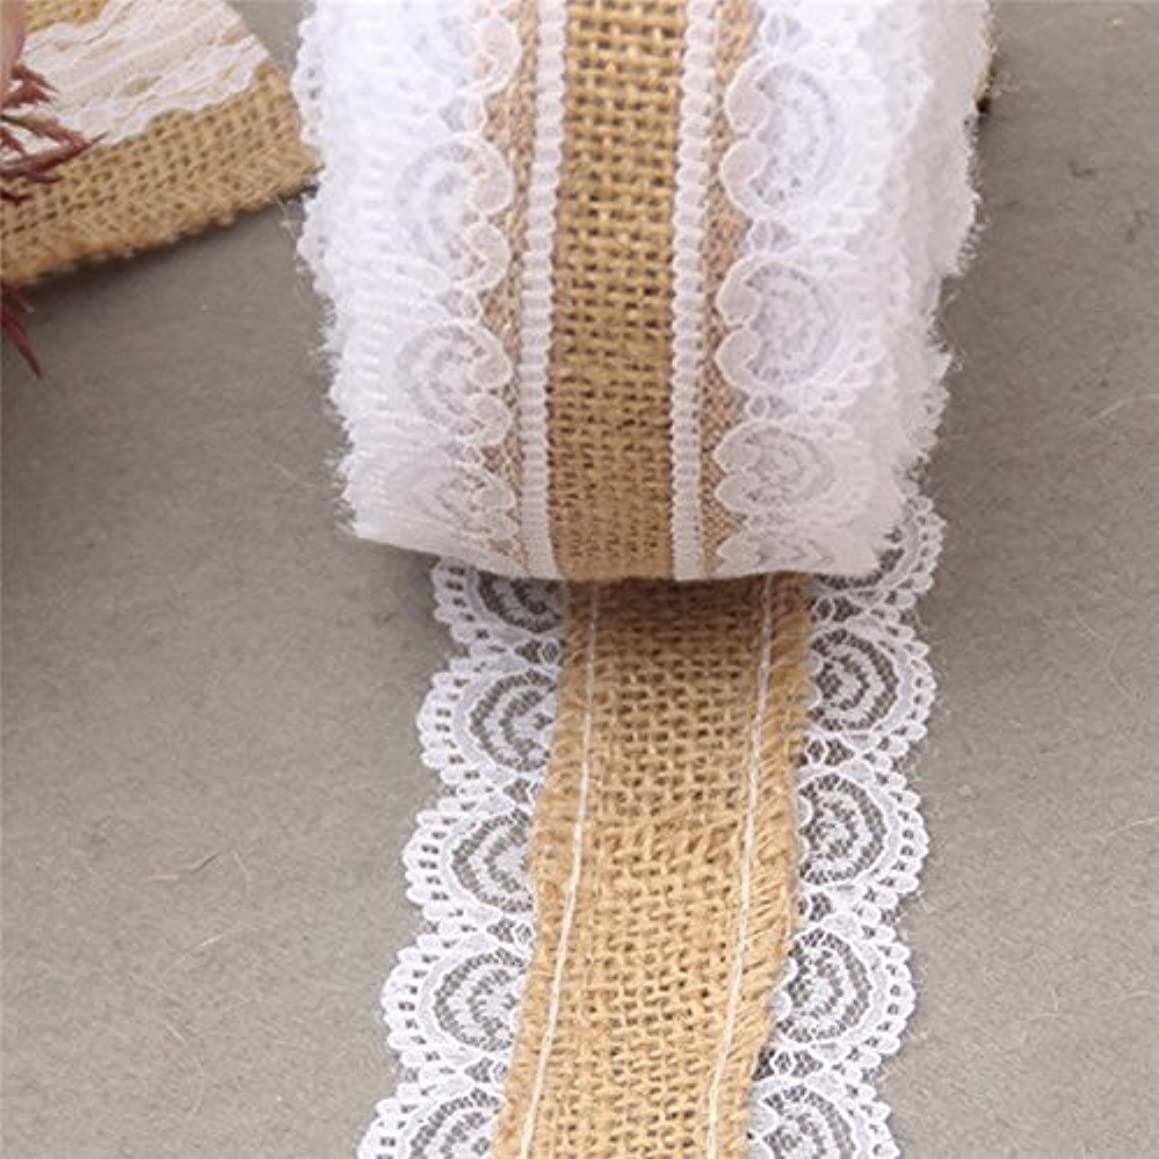 10 Yards Natural Jute Burlap Hessian Lace Ribbon Roll + White Lace Vintage Wedding Decoration Party Decorations Crafts Decorative